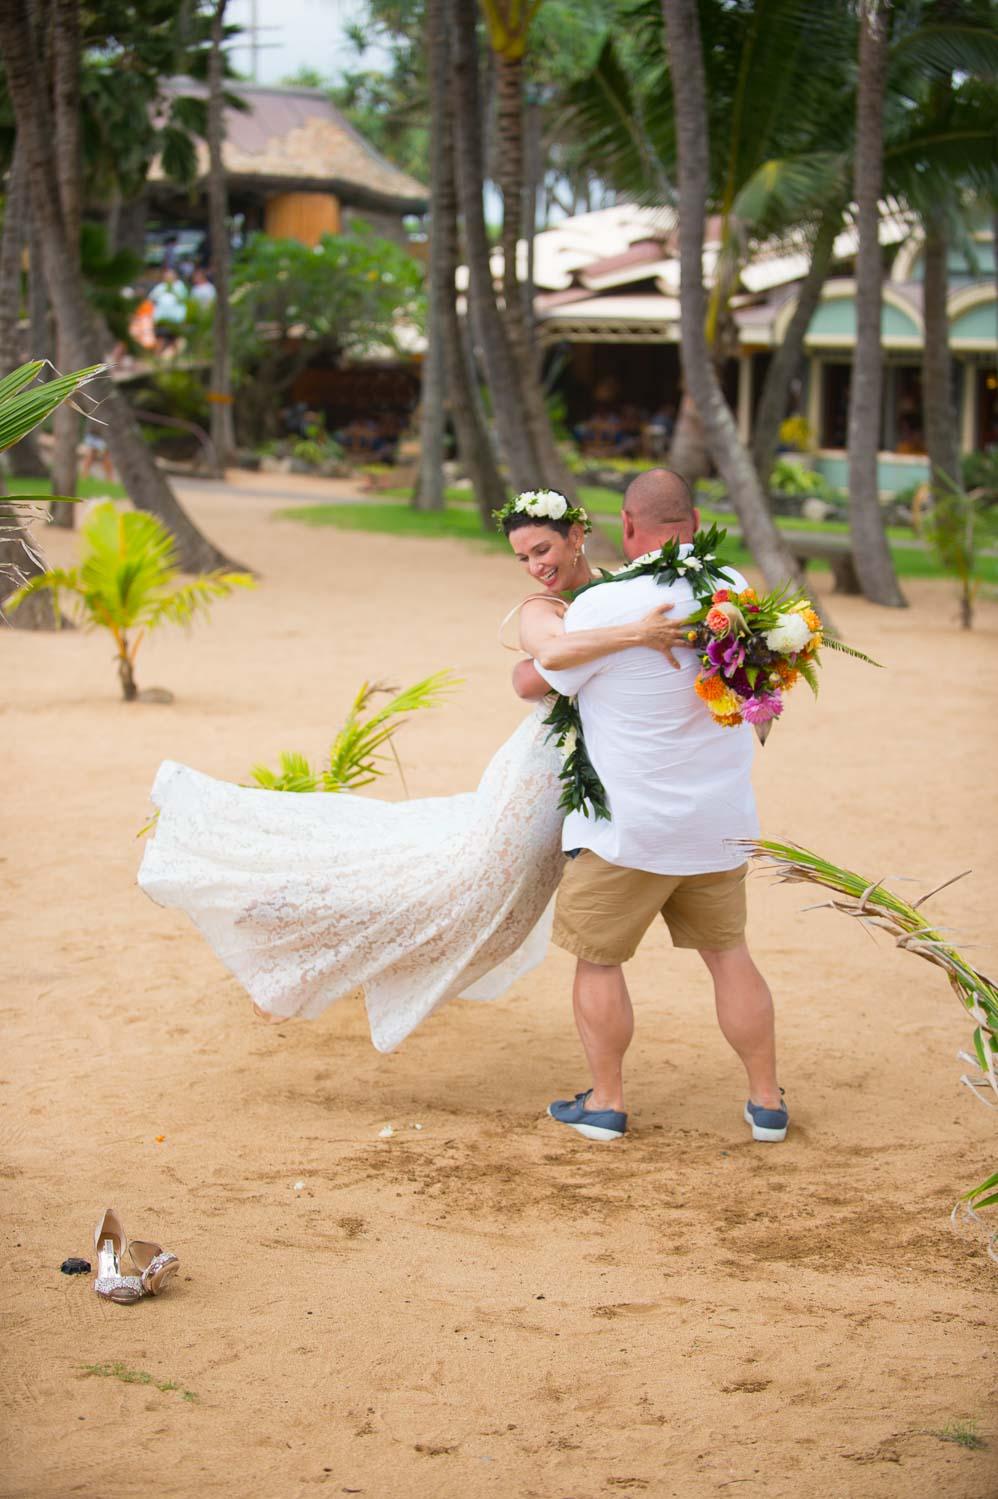 maui-wedding-photography-maui-wedding-venue-Tad-Craig-Photography-44.jpg